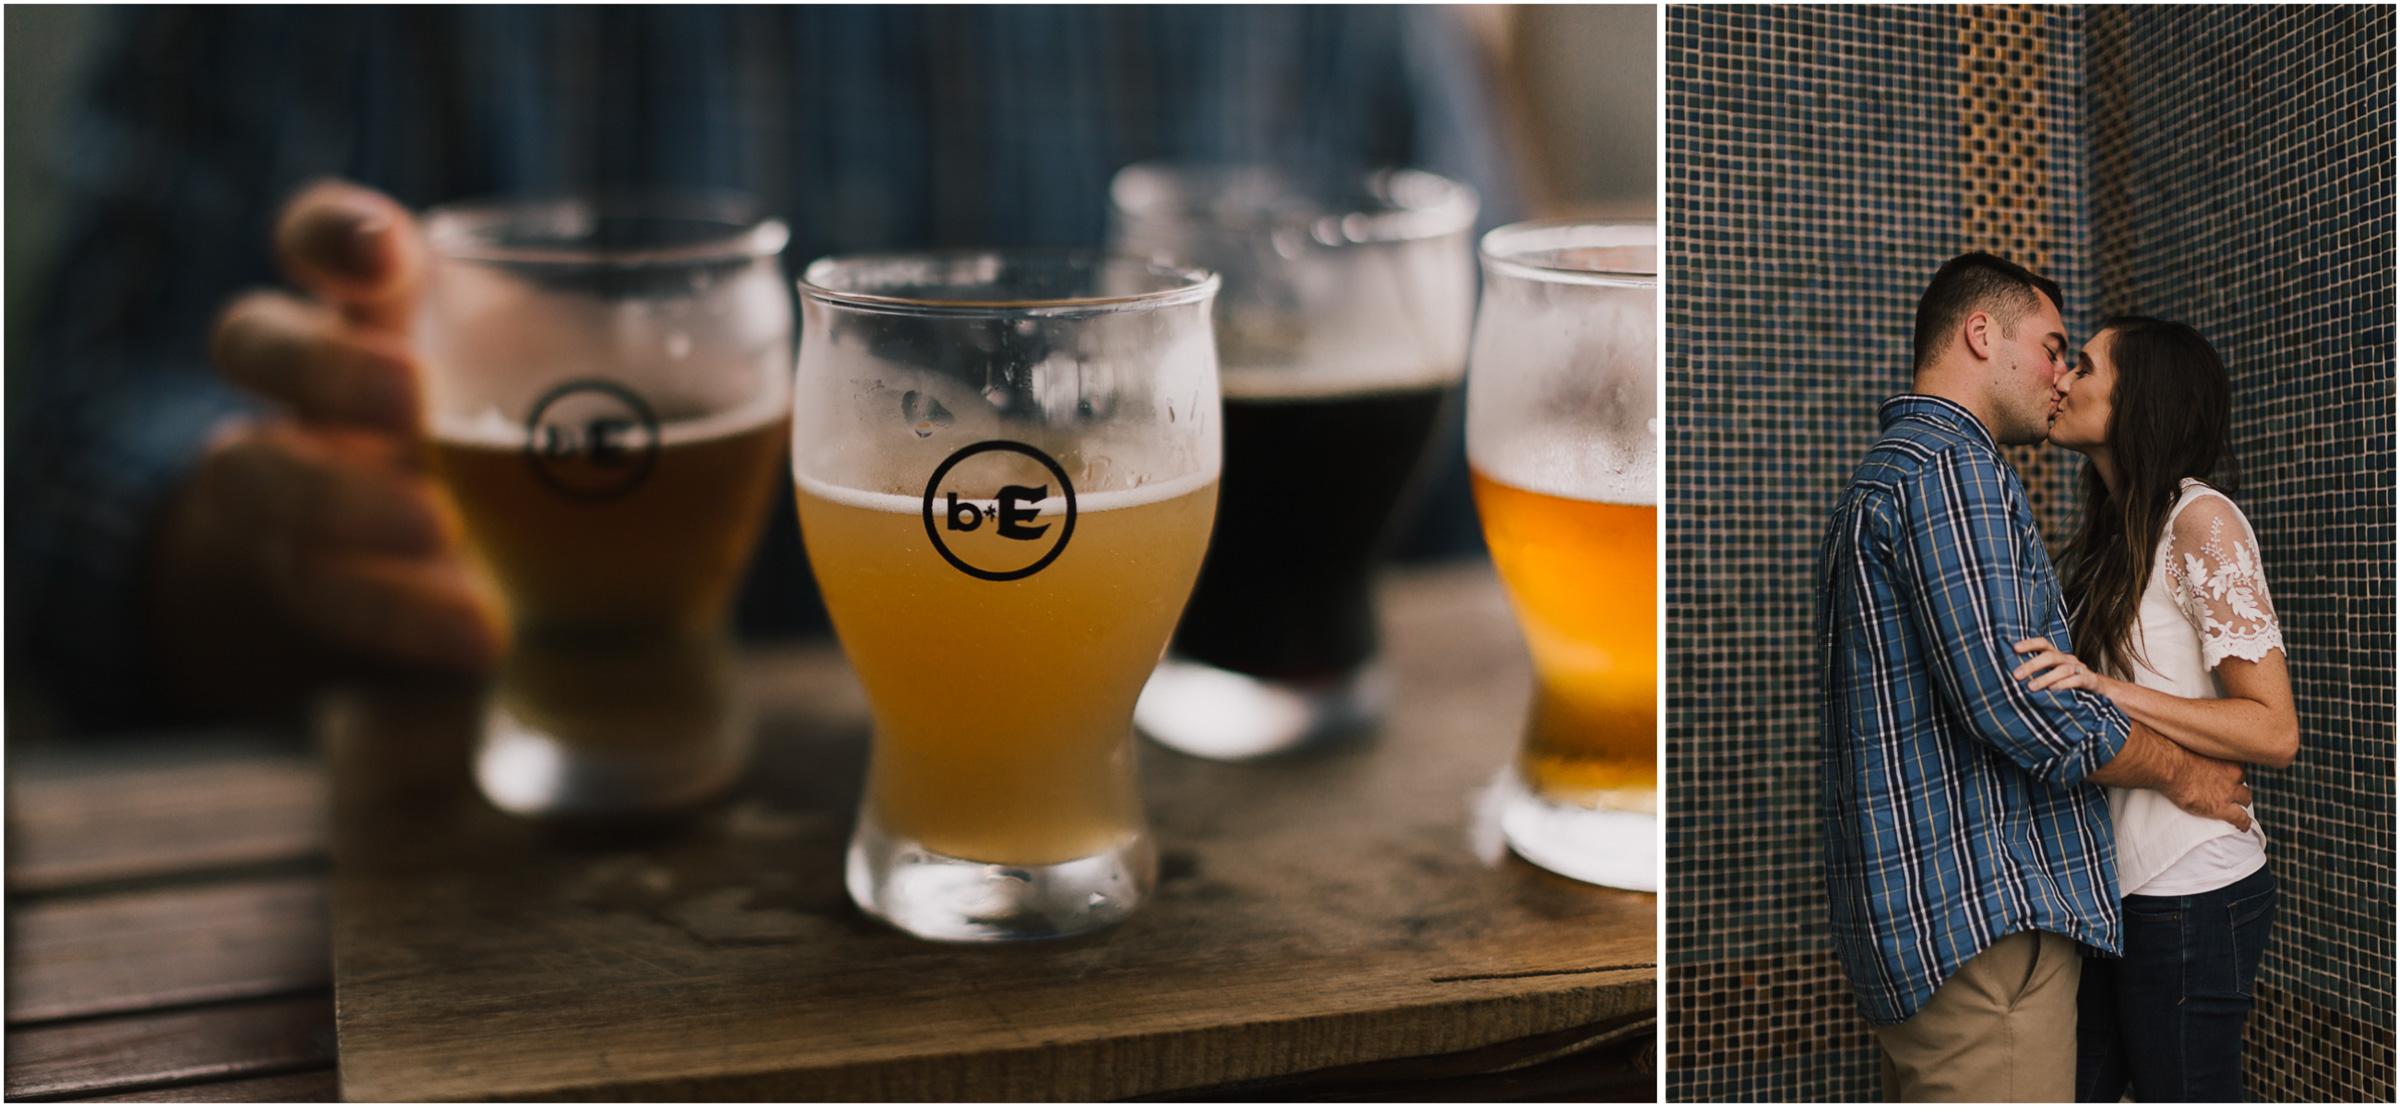 alyssa barletter photography emperial brewery engagement session downtown kansas city kc crossroads -15.jpg